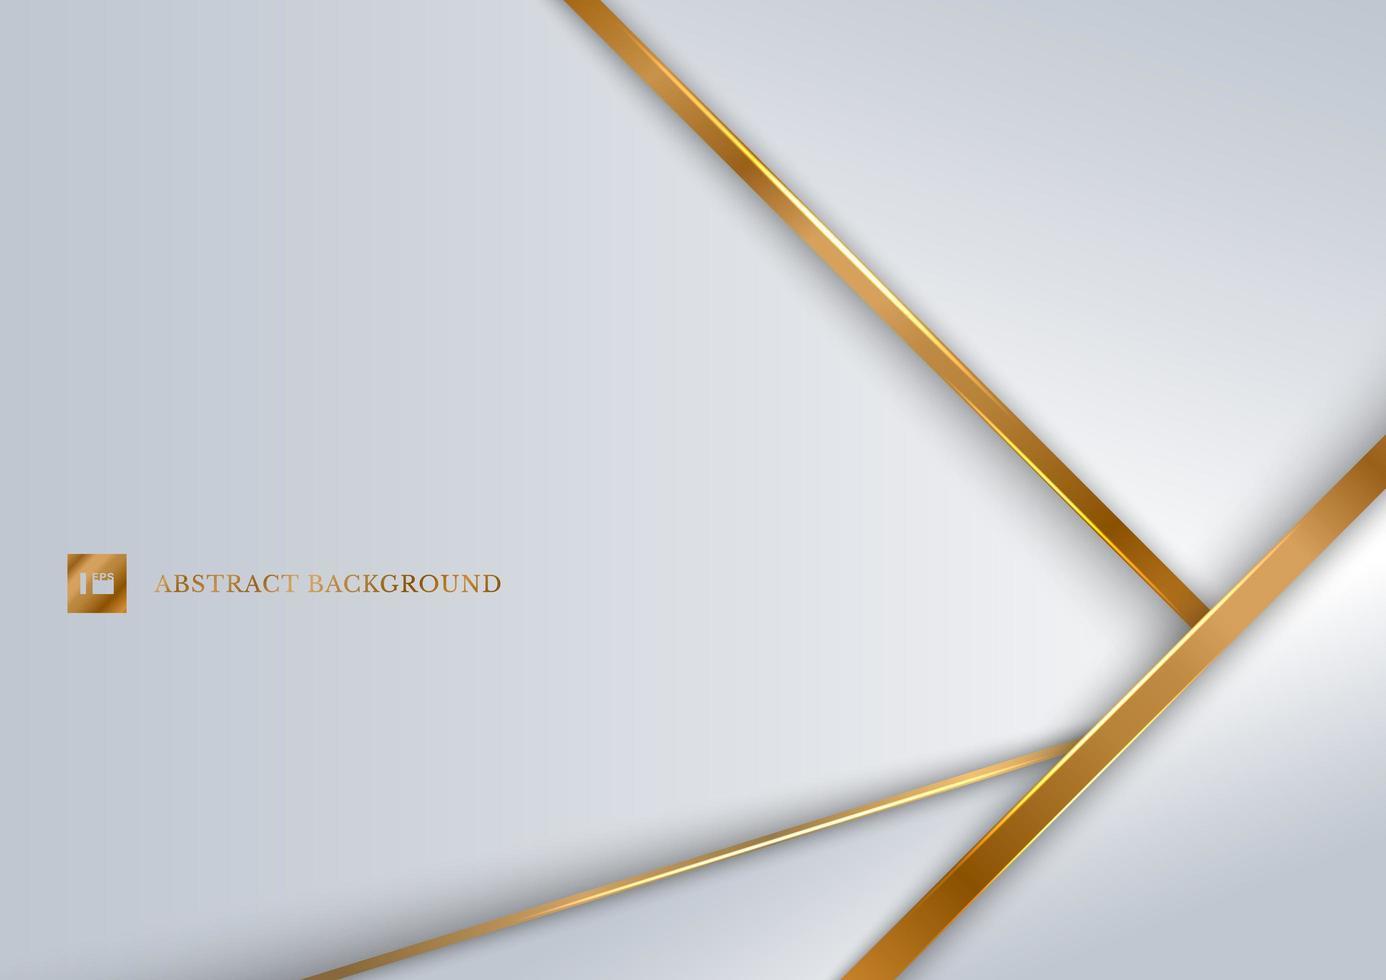 abstracte witte achtergrond geometrische overlappende lagen vector